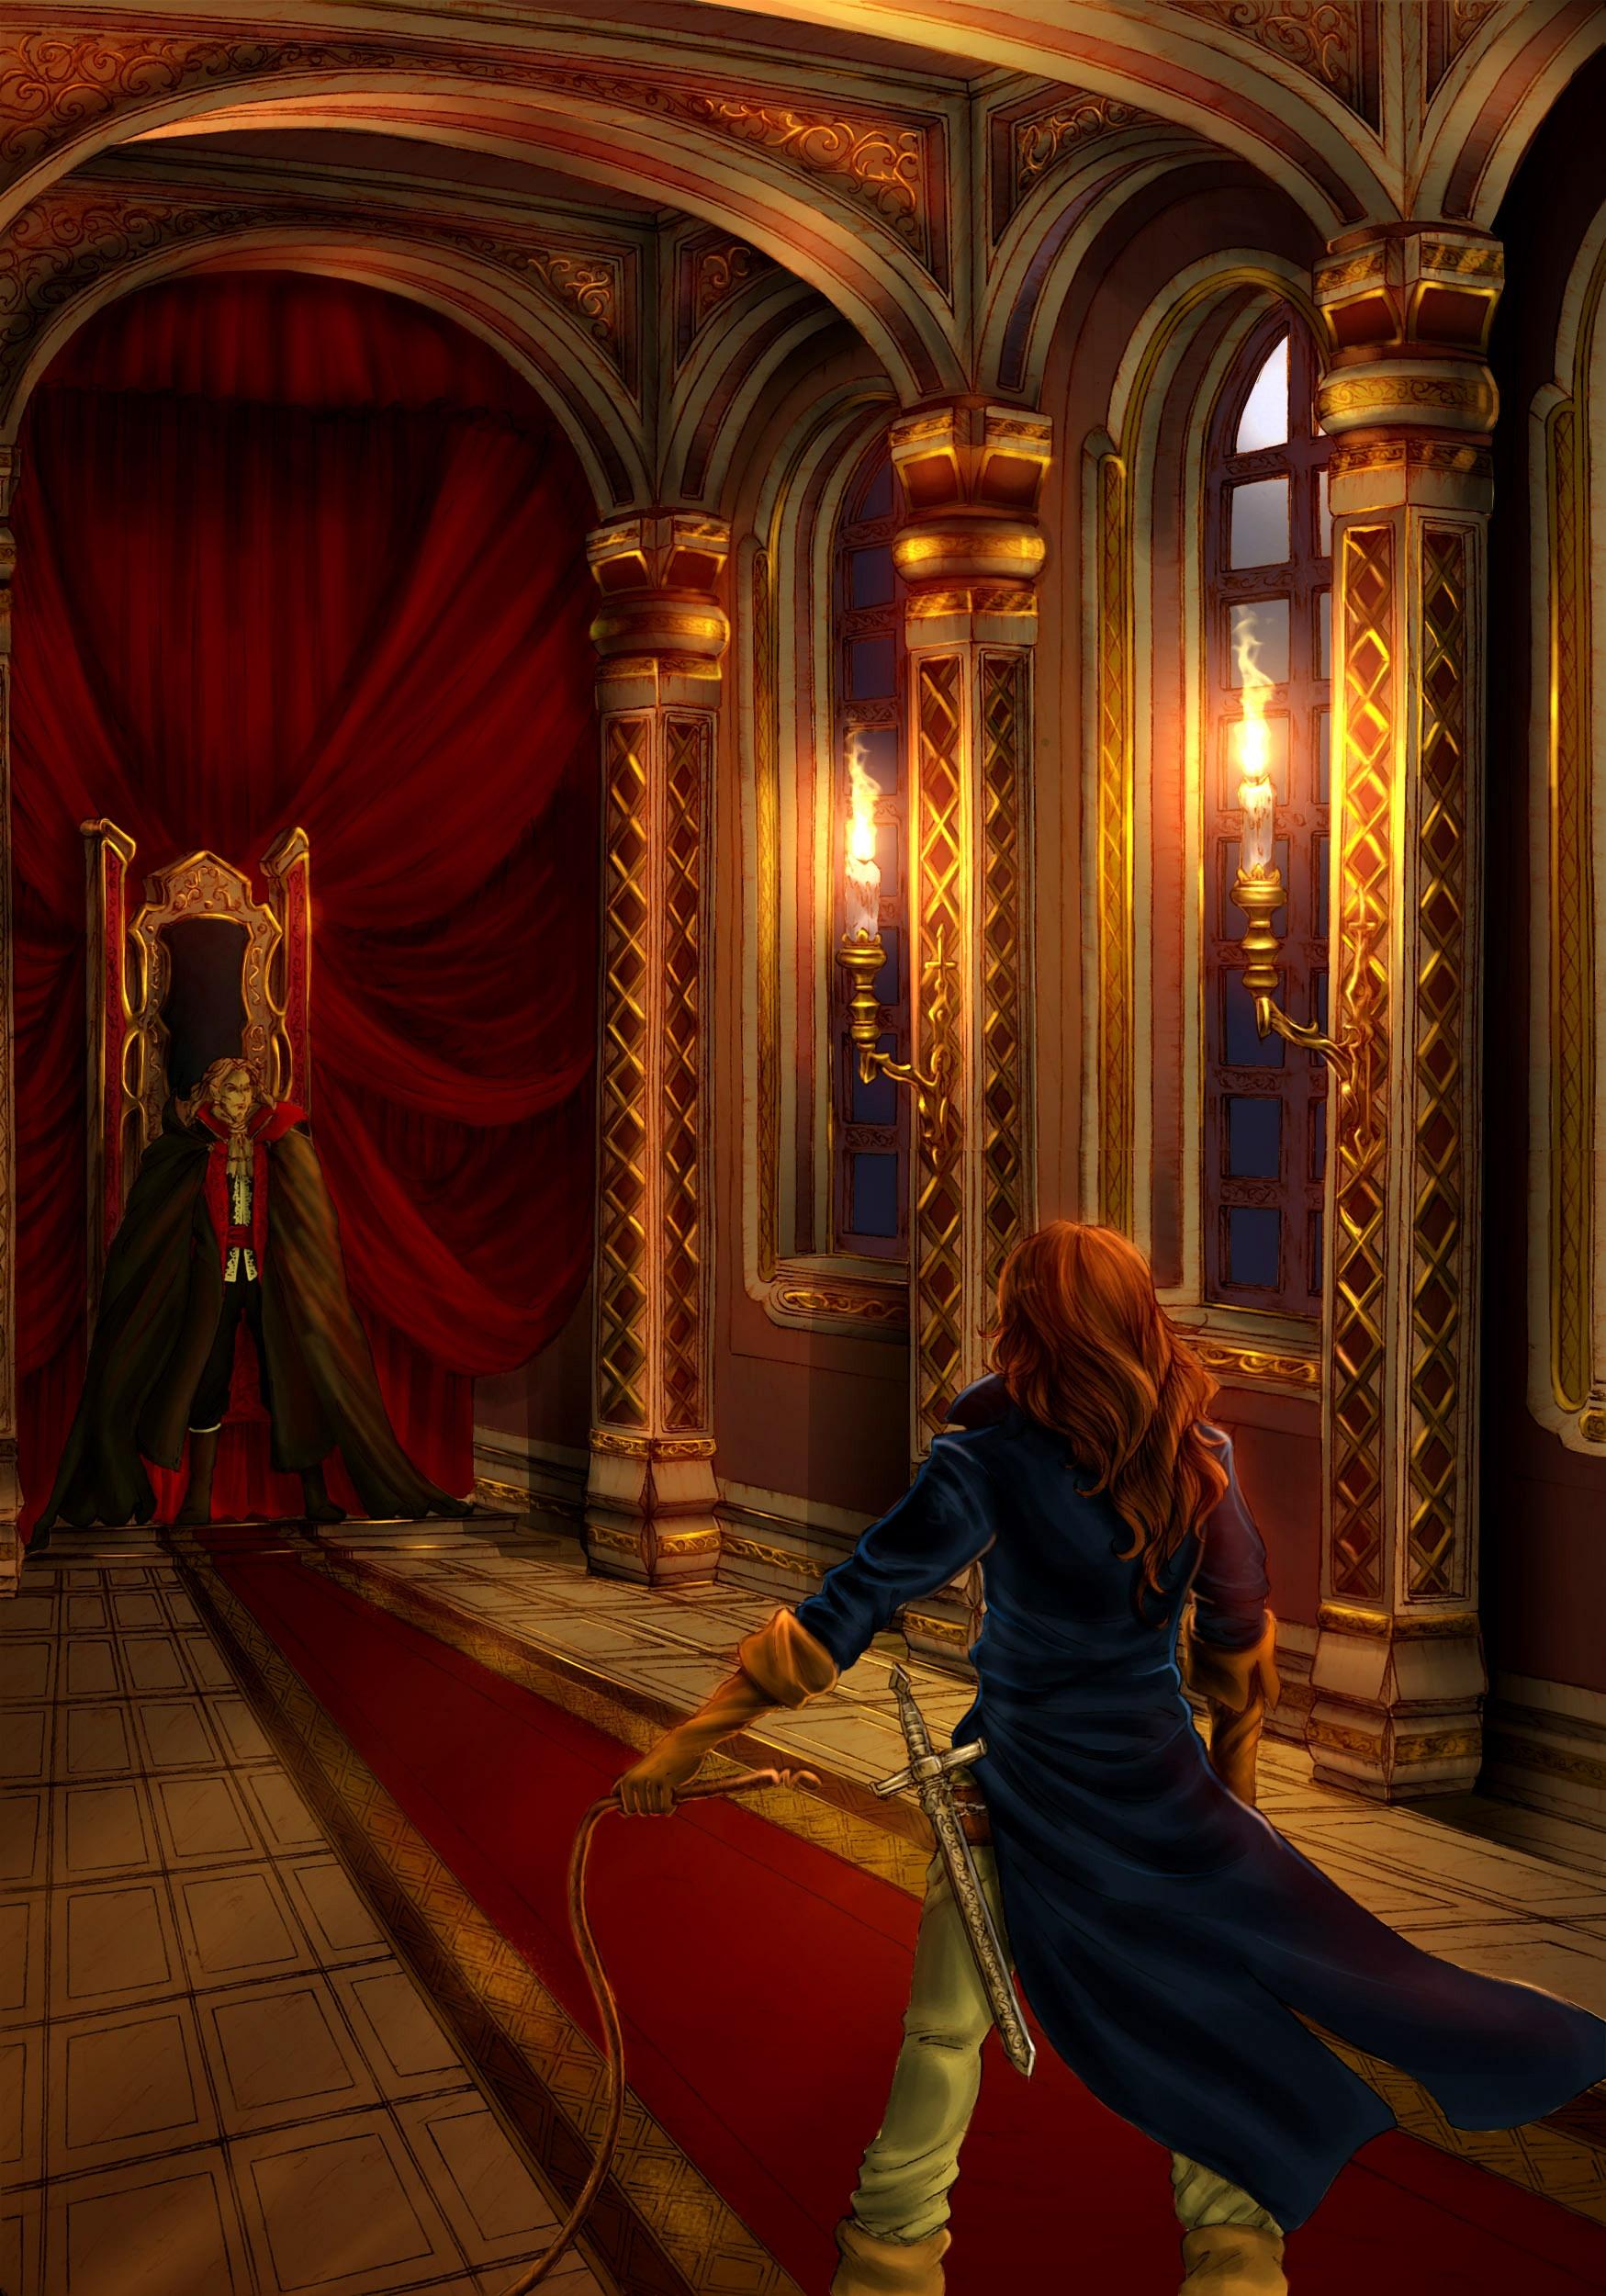 Castlevania Symphony Of The Night : castlevania, symphony, night, Retro, Night:, Castlevania:, Symphony